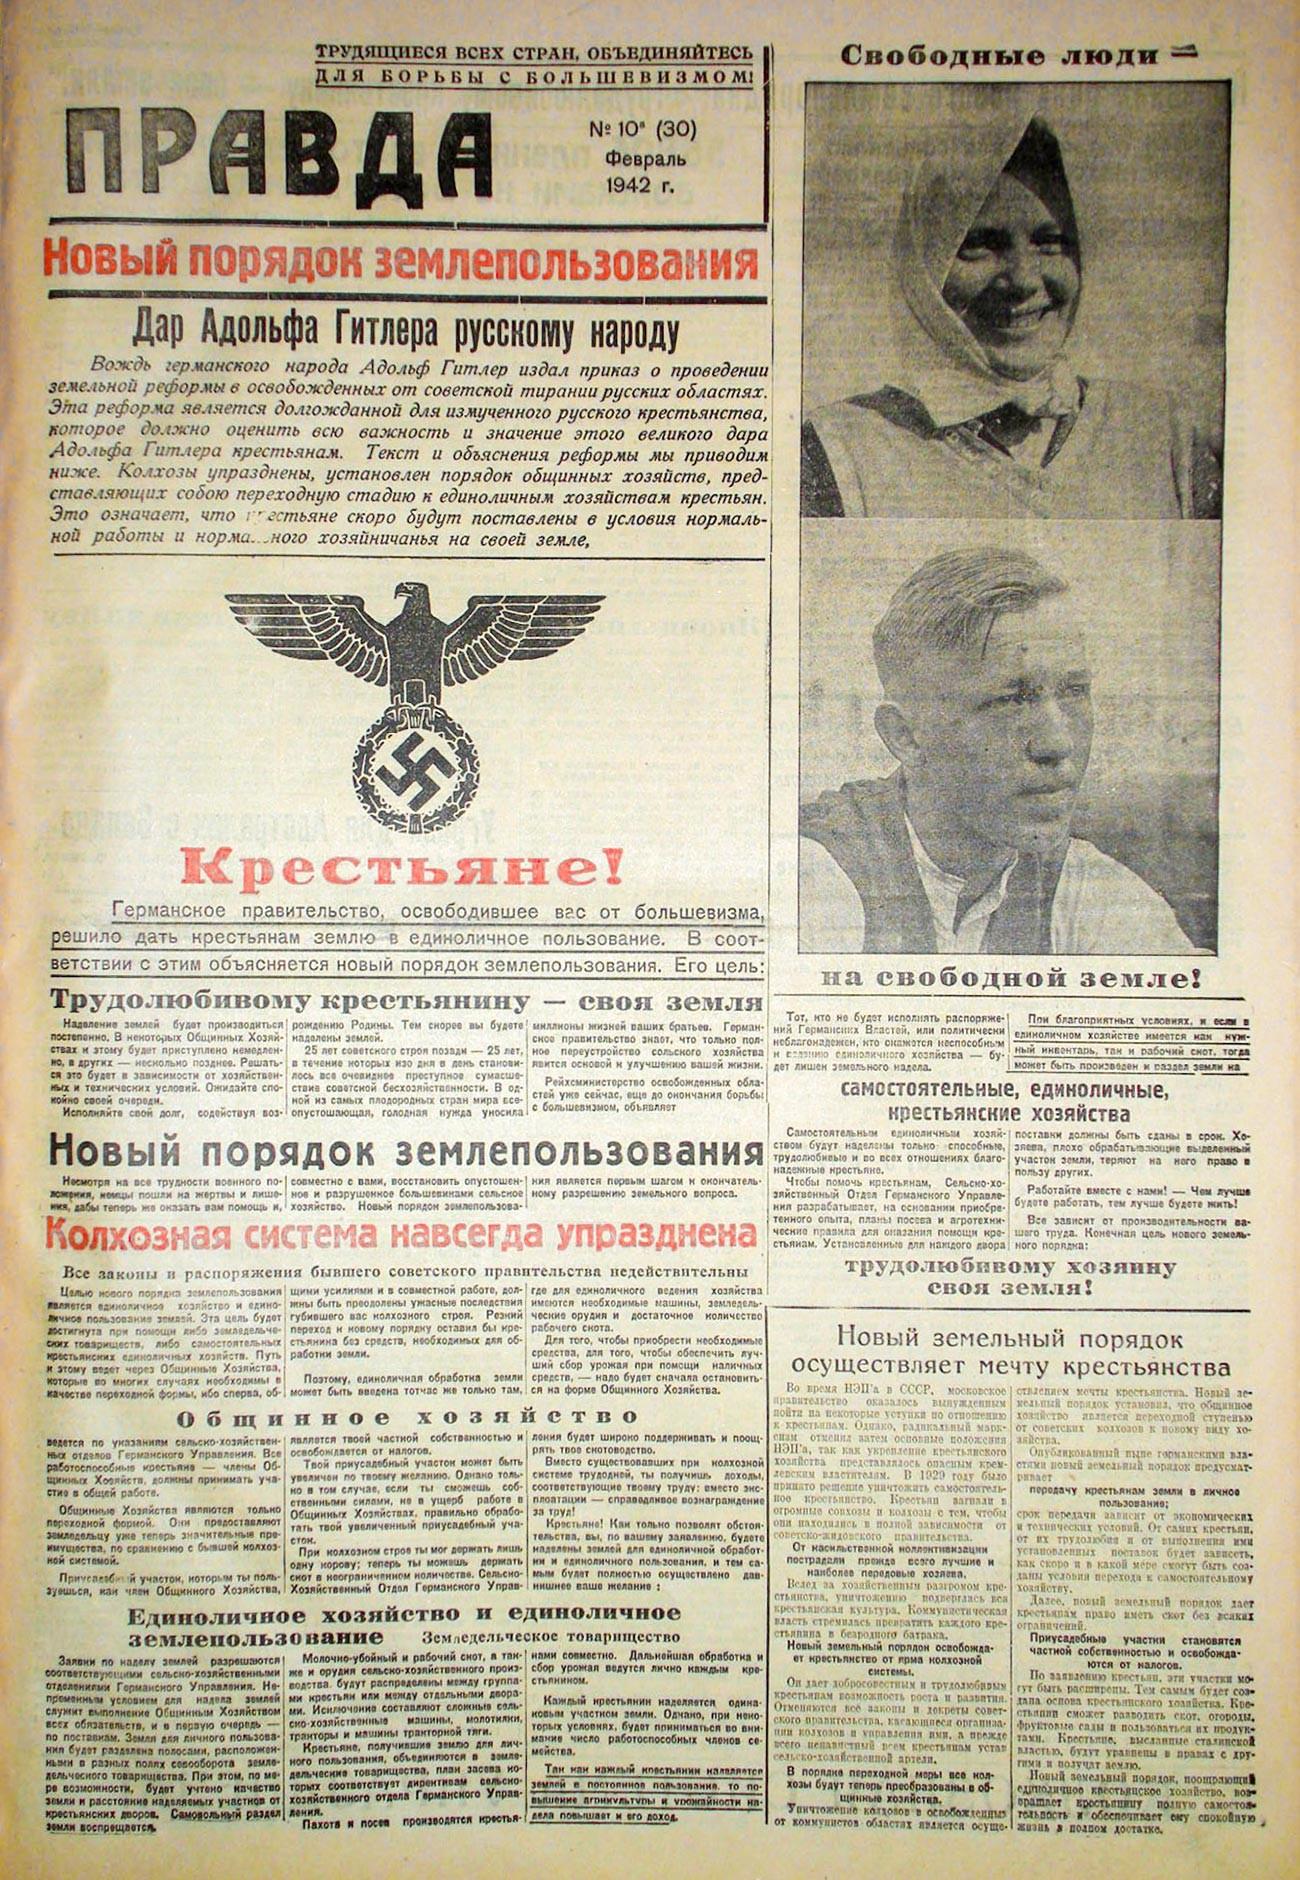 Pravda (Truth) collaborationist newspaper.